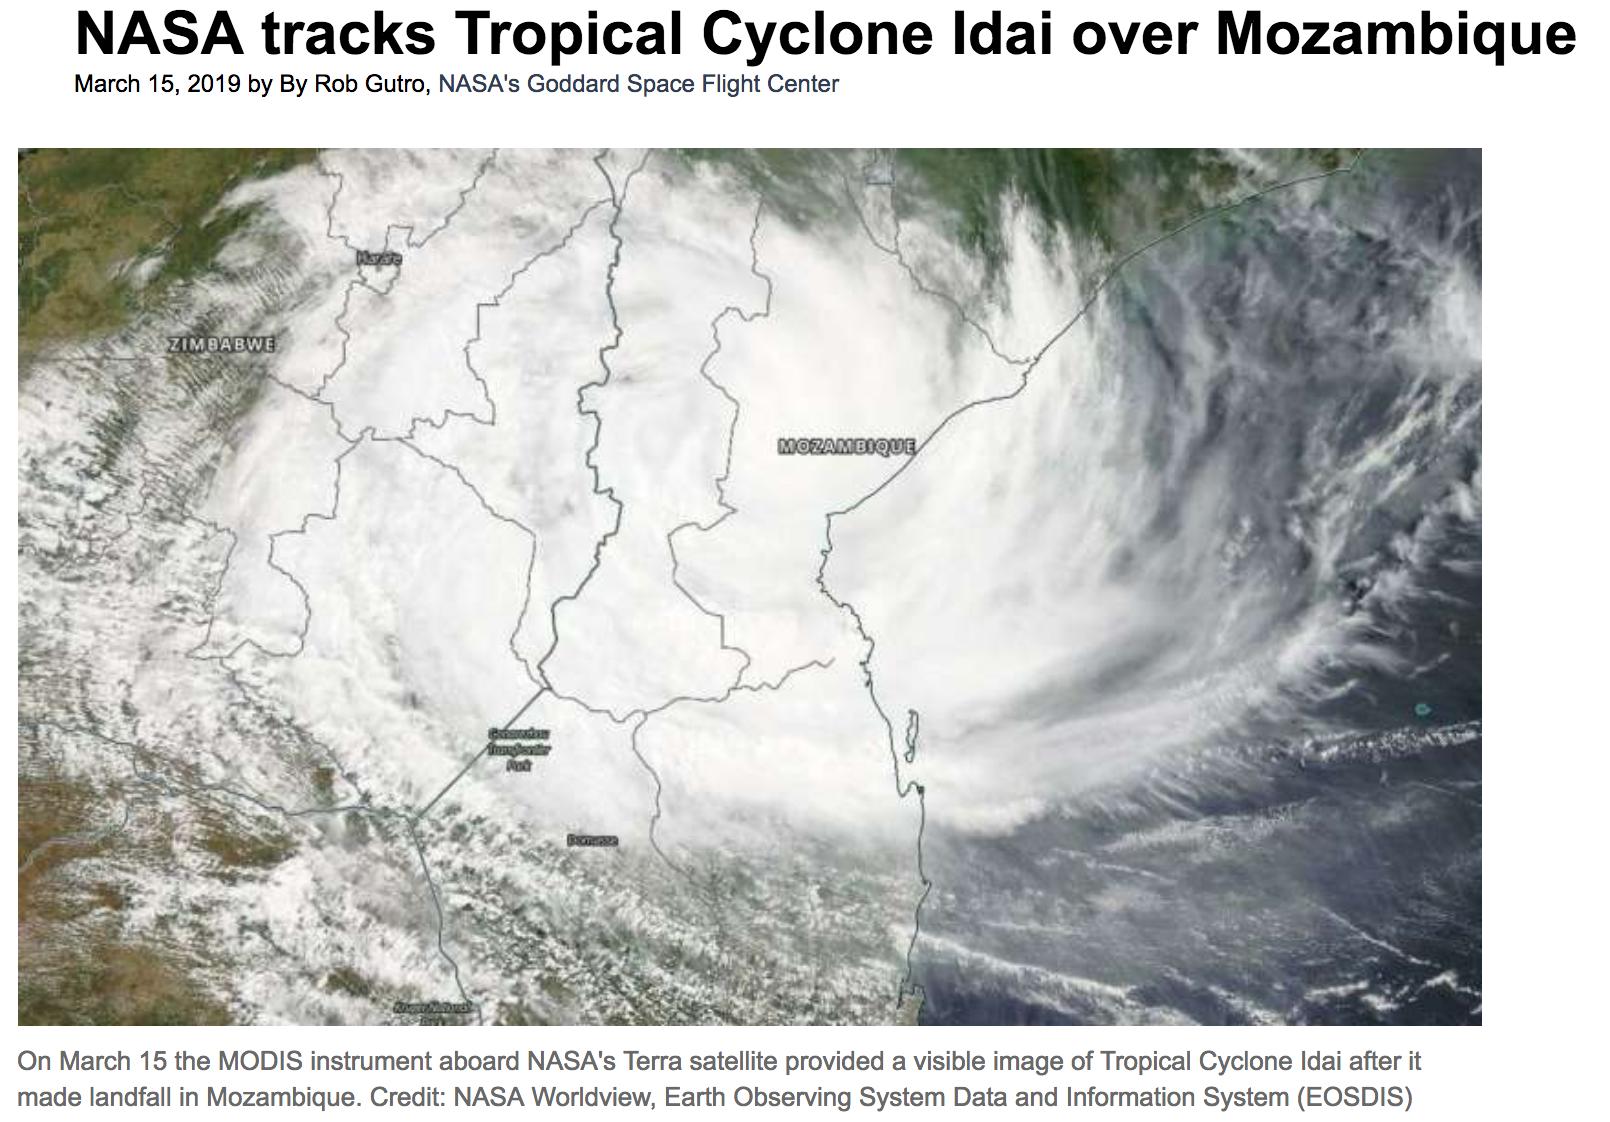 Tropical cyclone Idai